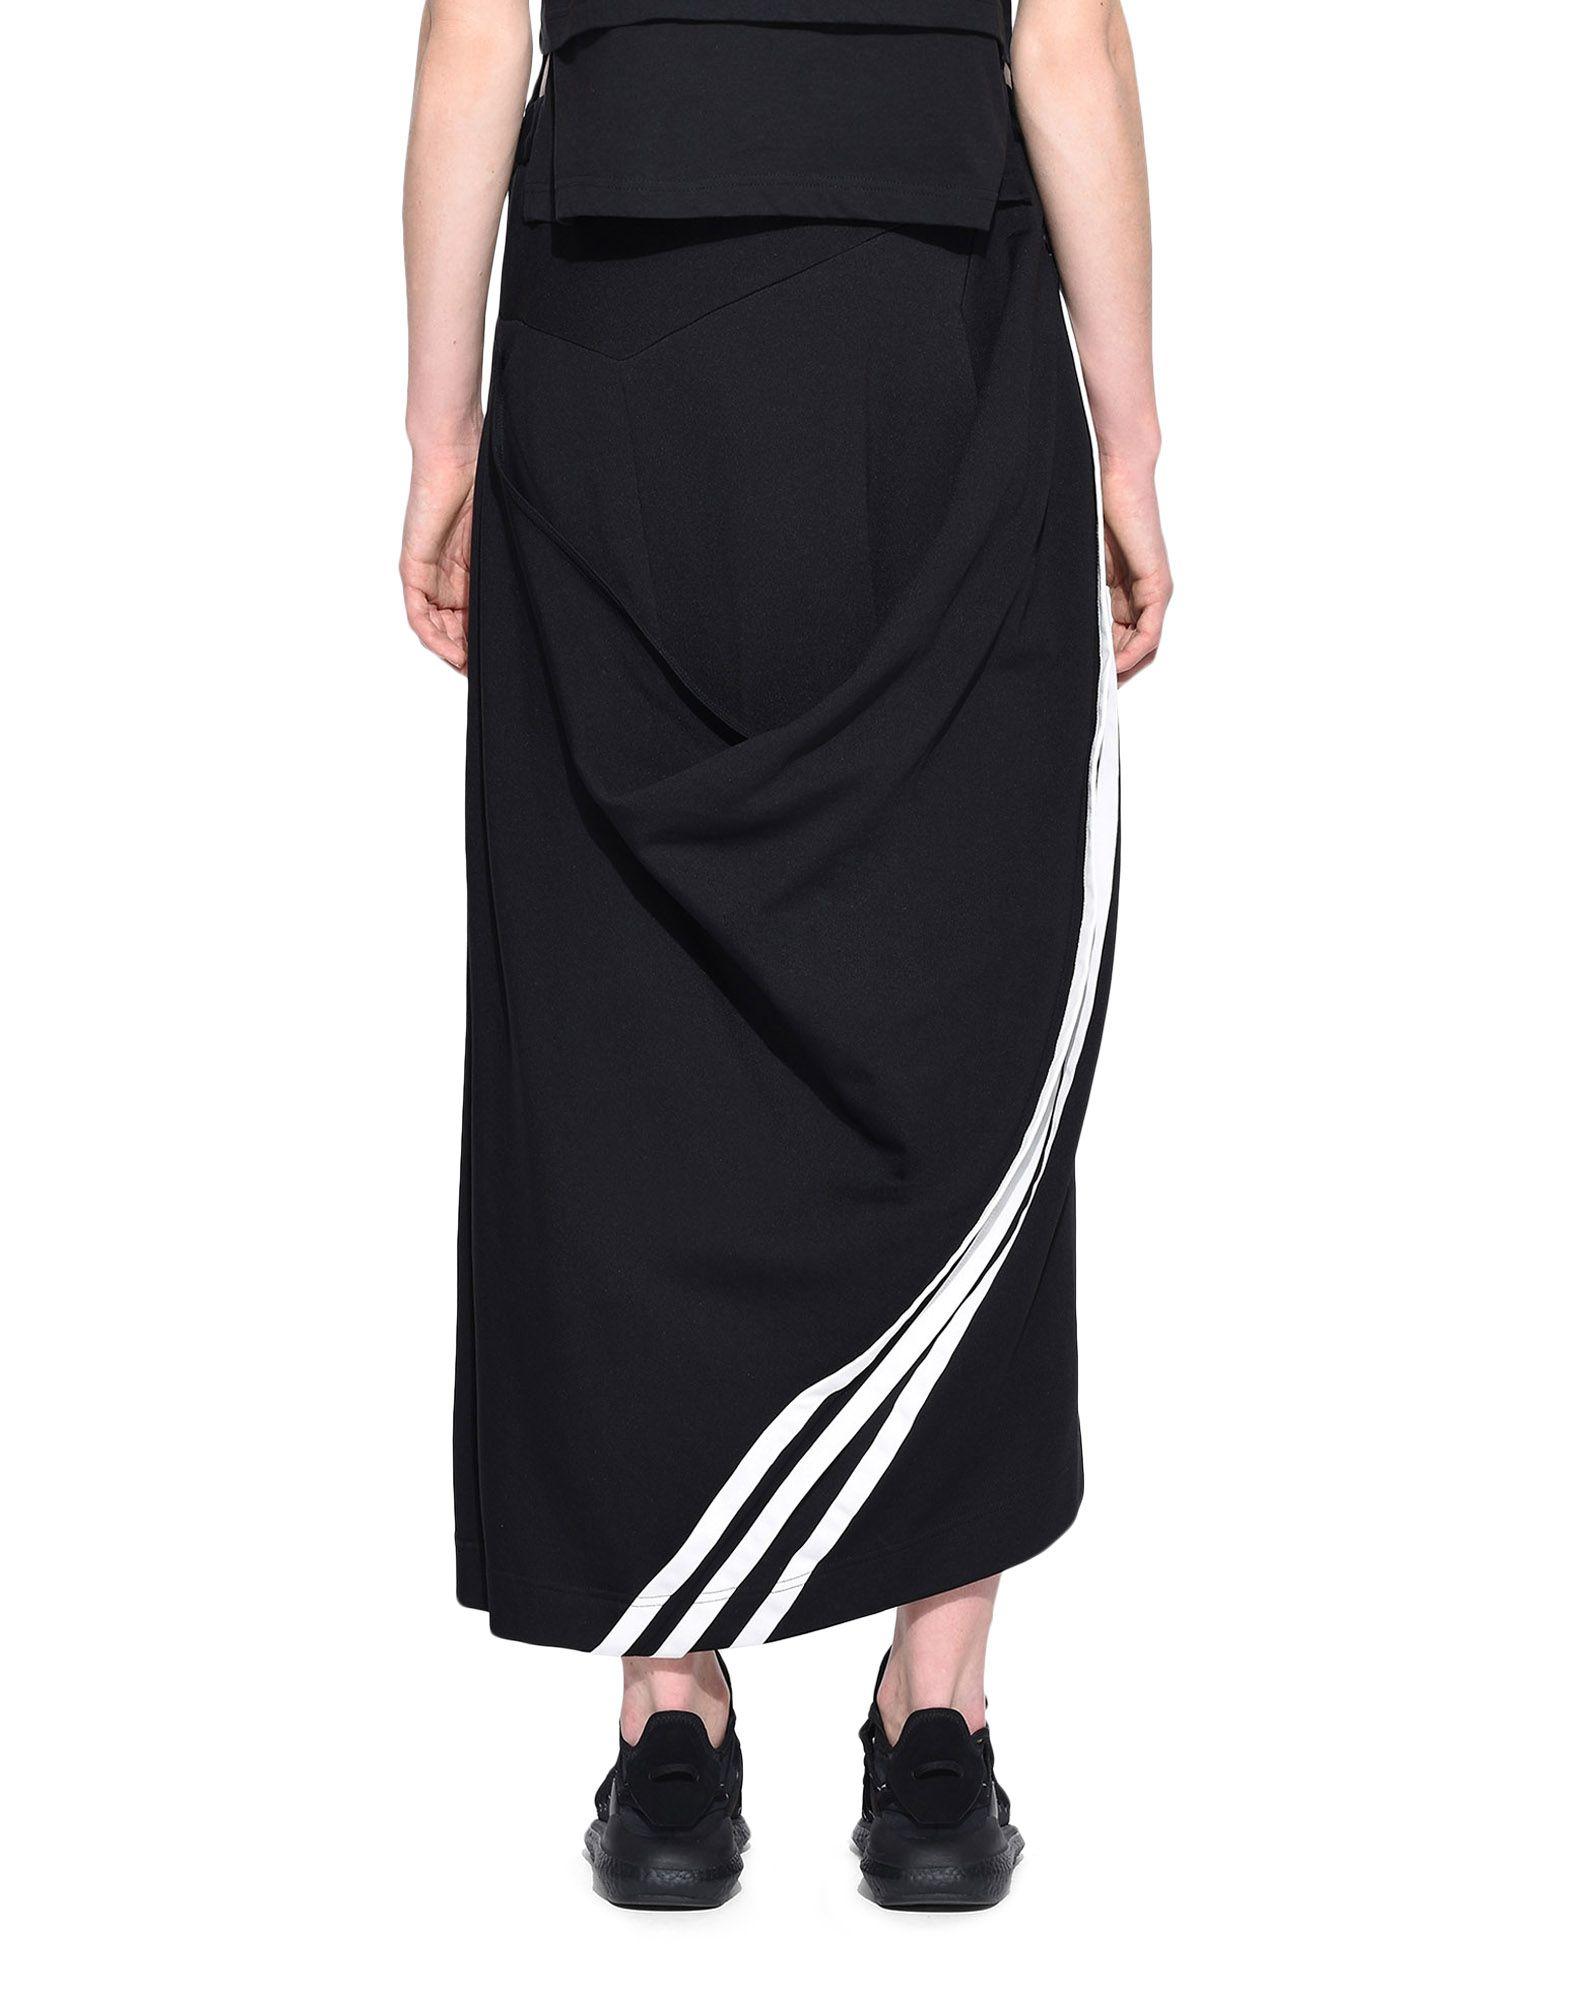 Y-3 Y-3 3-Stripes Drape Skirt Knee length skirt Woman d